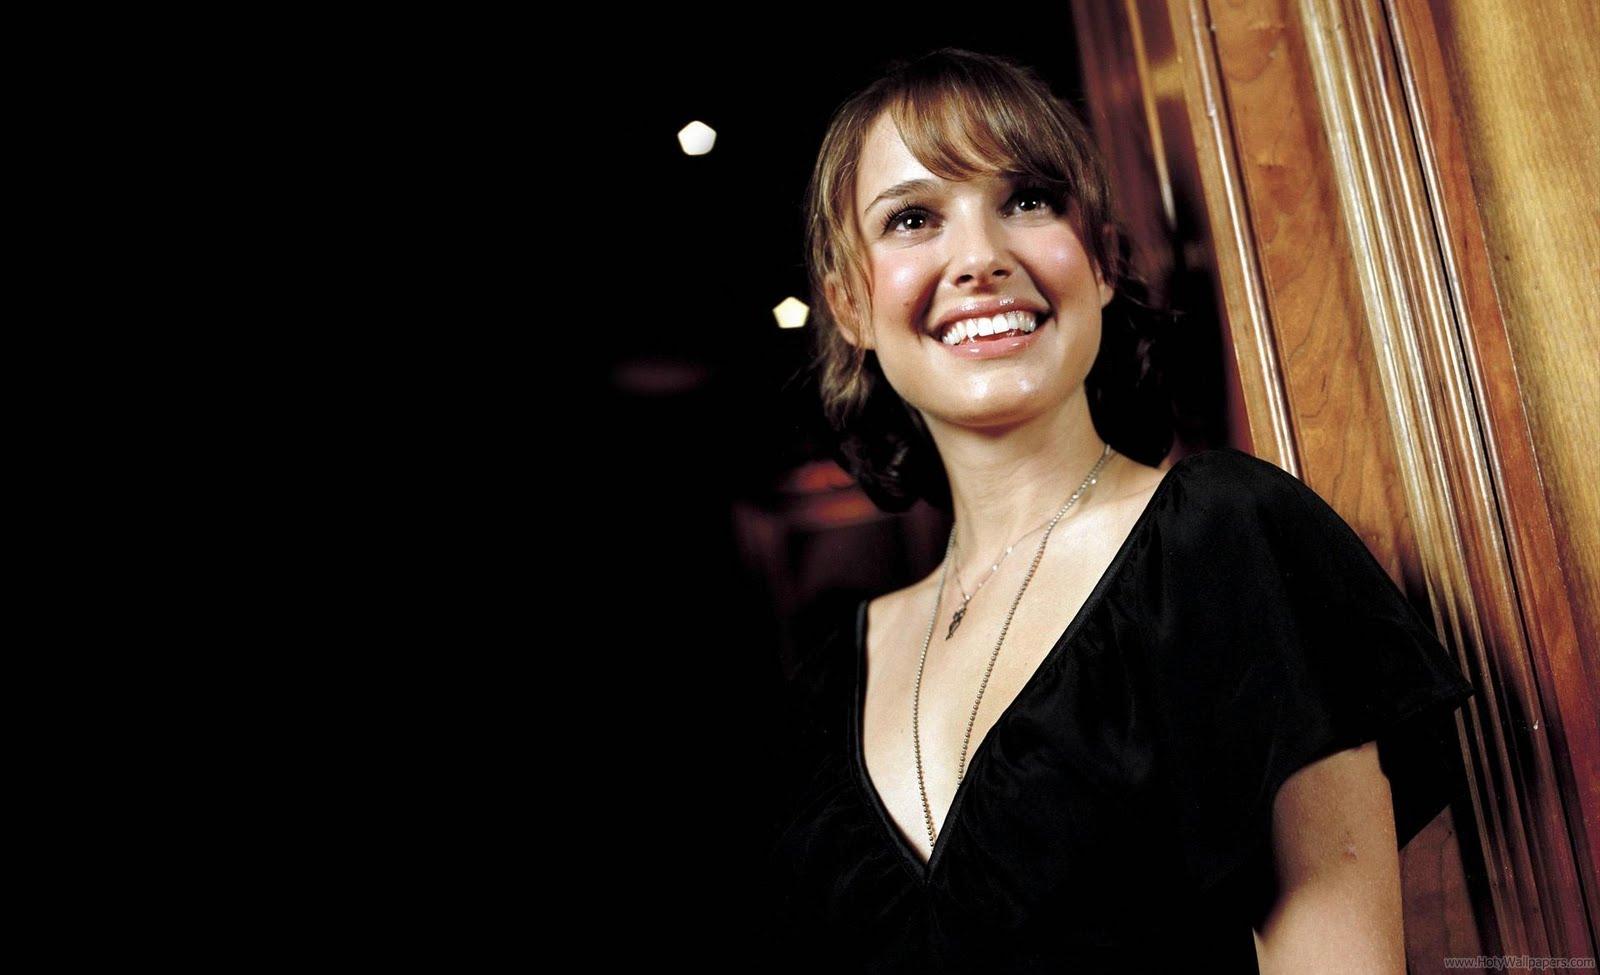 Natalie Portman Hollywood Wallpapers: Natalie Portman Biography And Wallpapers